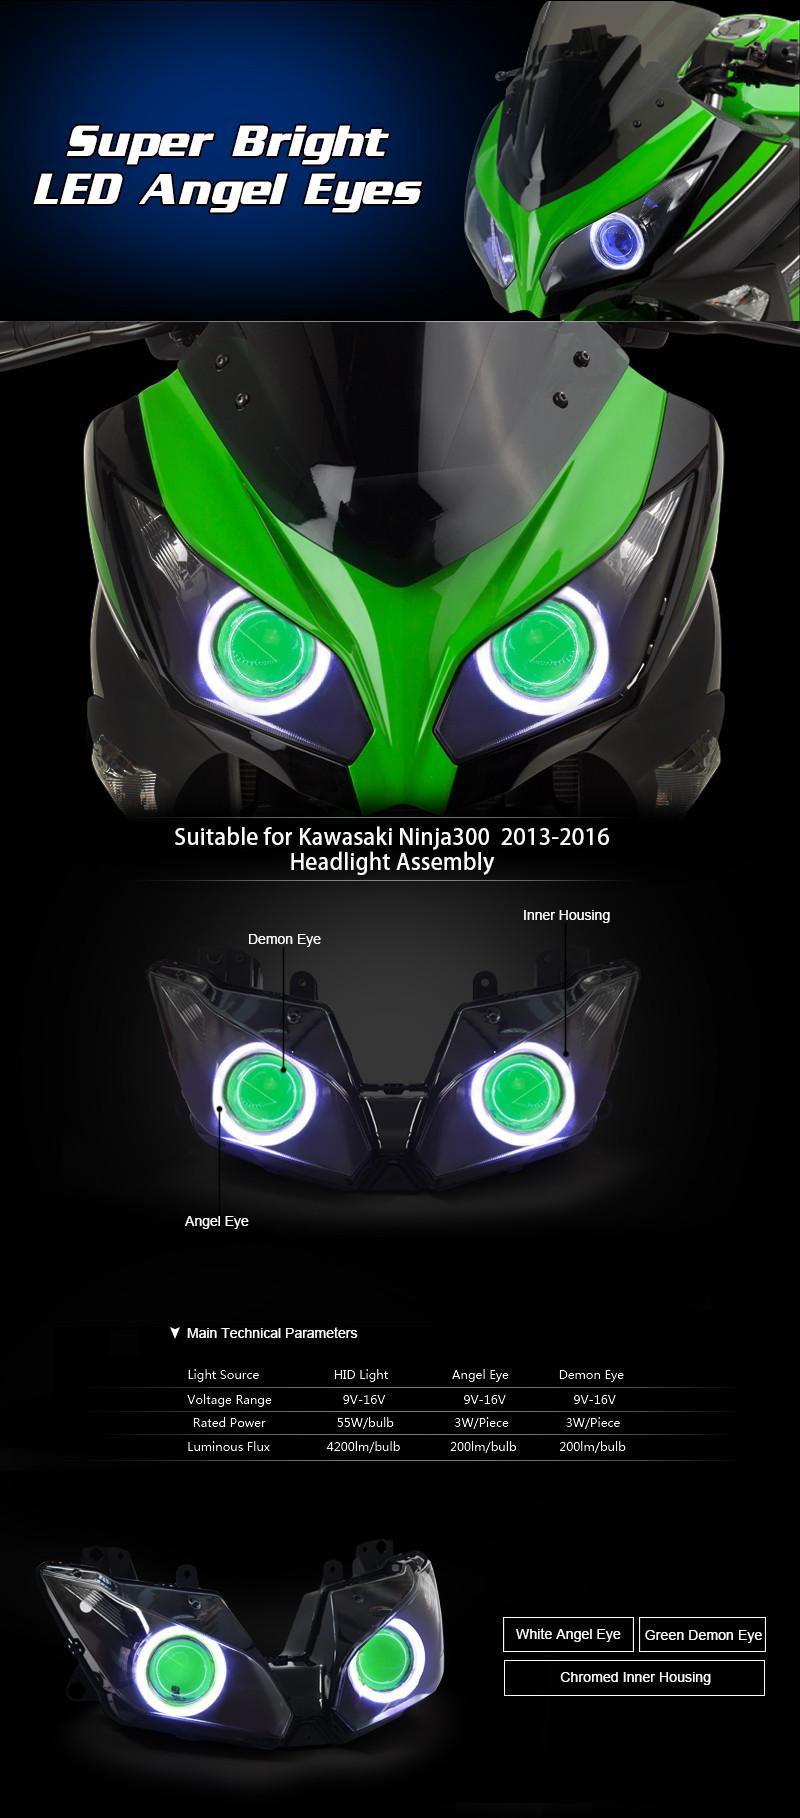 KT Headlight for Kawasaki Ninja 300 2013-2016 LED Angel Eye Green Demon Eye Motorcycle HID Projector Assembly 2014 2015